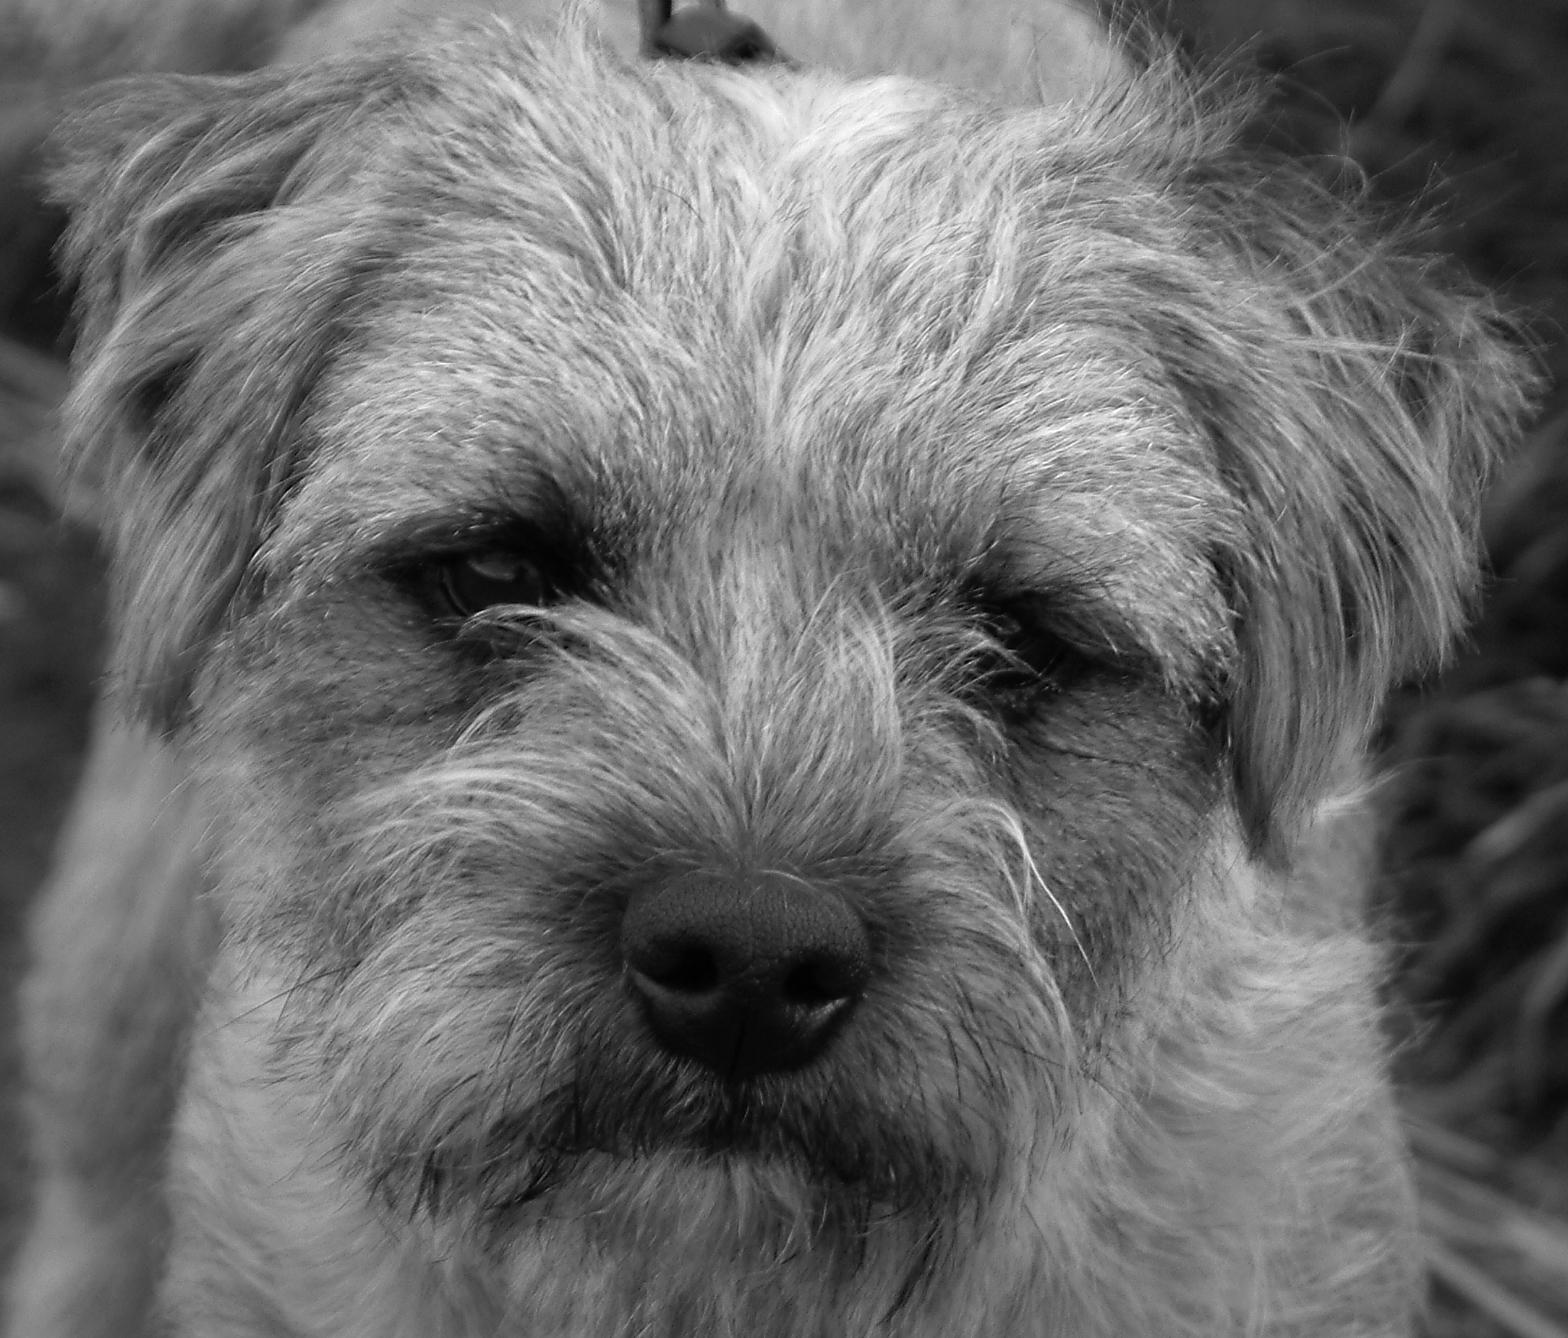 Benji Faze Rug Dog Breed: The Woodlands Dog Park Club 'Treesure' Hunt To Benefit